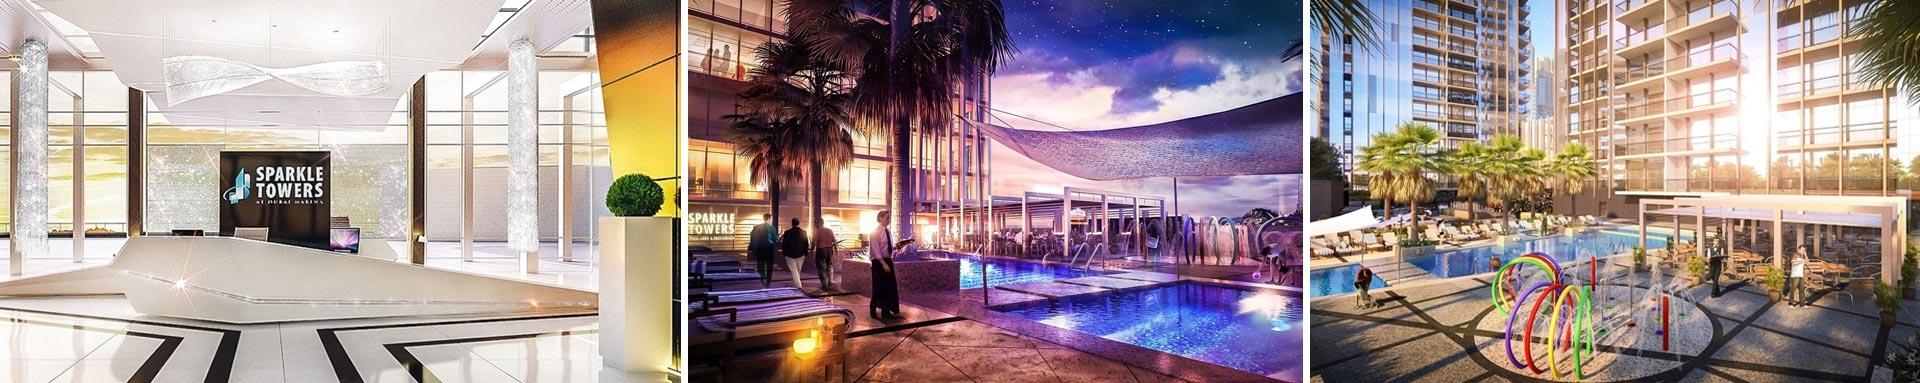 Sparkle Tower Dubai Marina